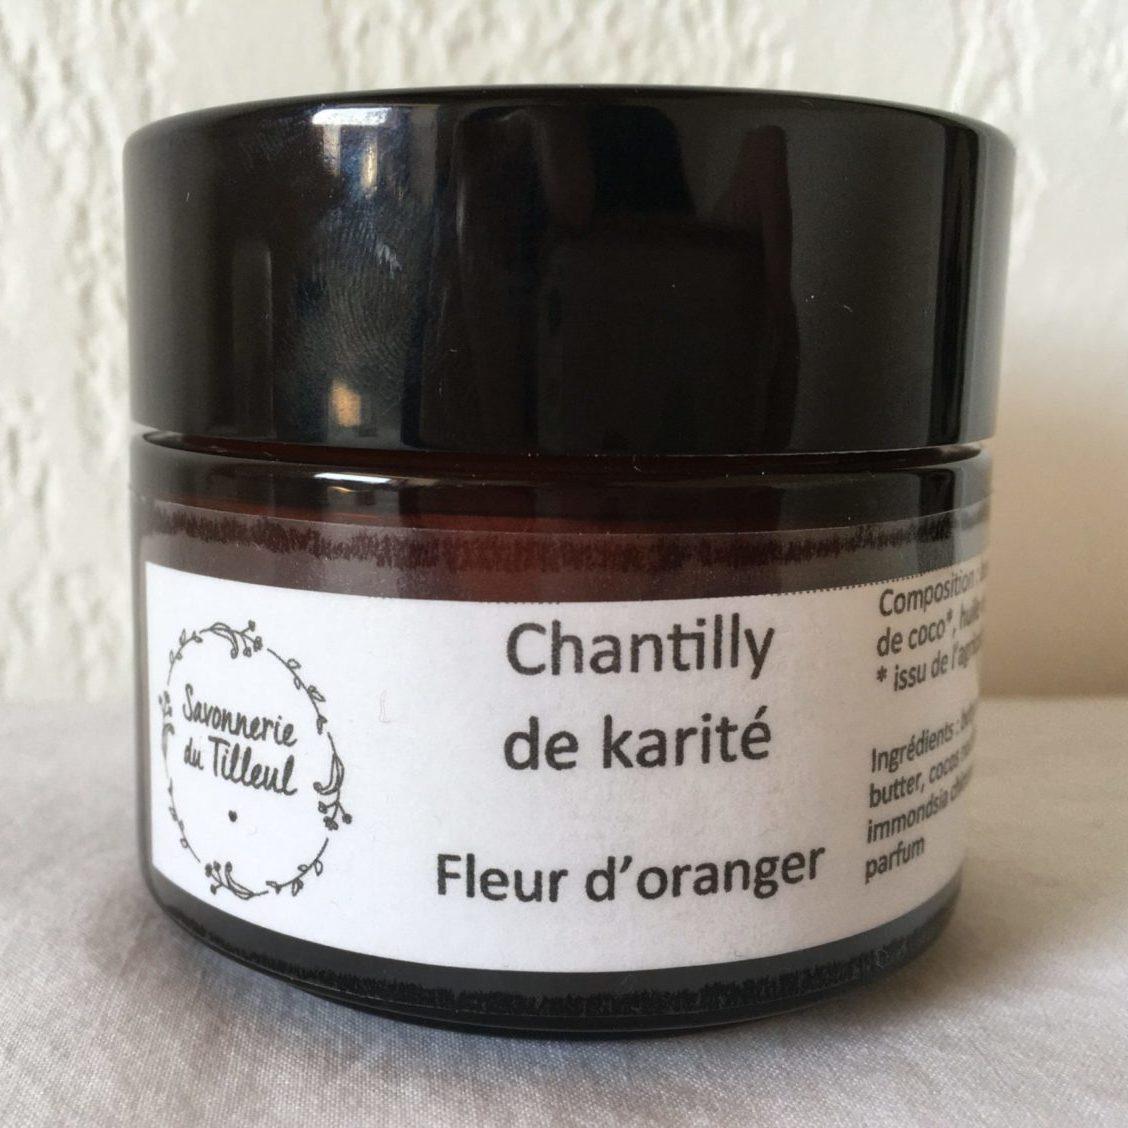 chantilly-karité-creme-naturelle-bio-hydratante-nourrissante-vanille-savonneriedutilleul